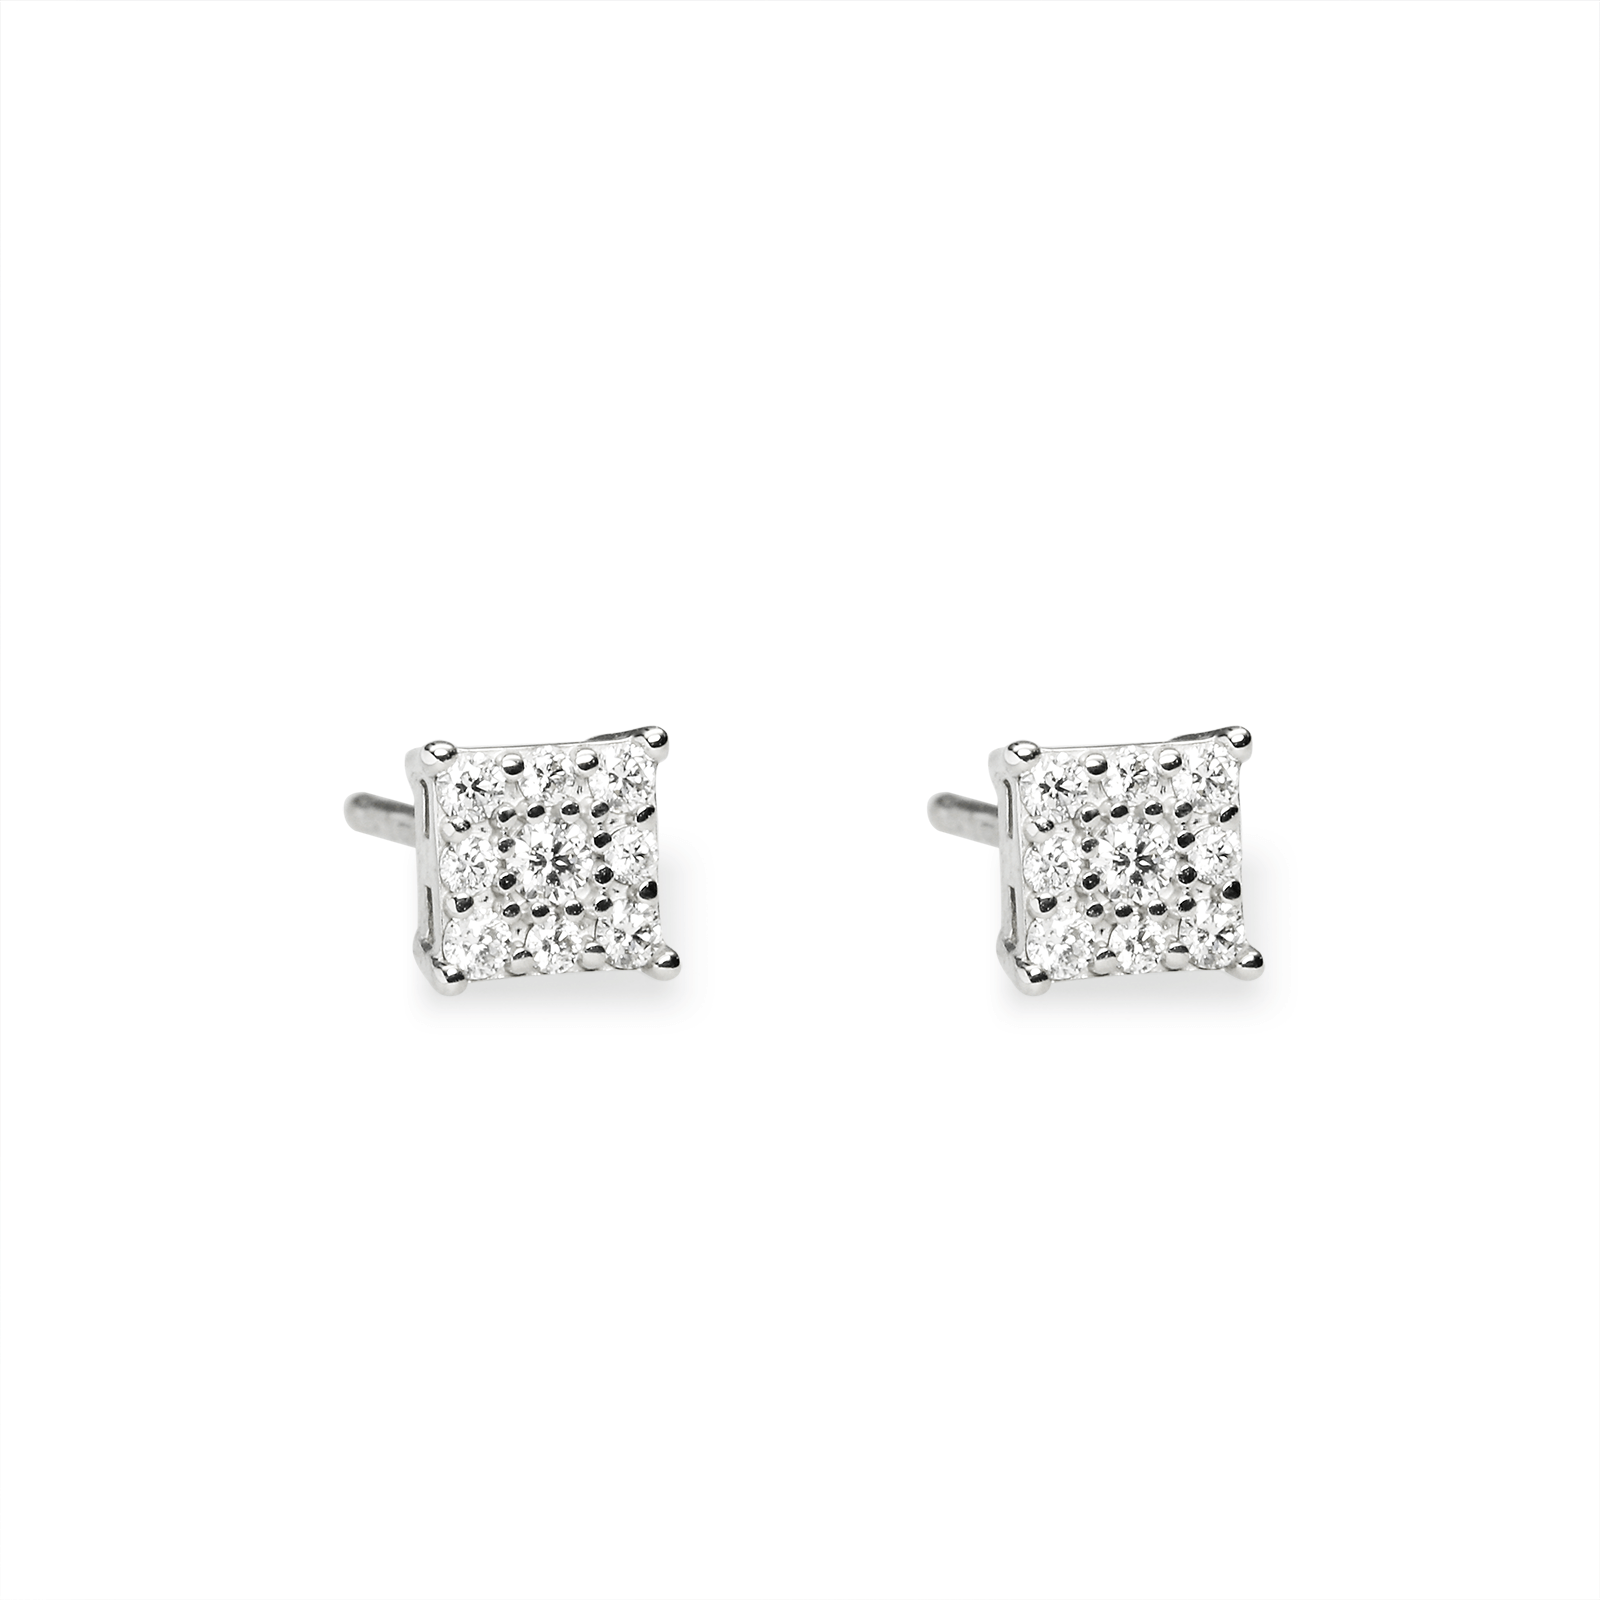 Diamond 0,02 ct - 2 x; 0,01 ct - 8 x; 0,005 ct - 8 x